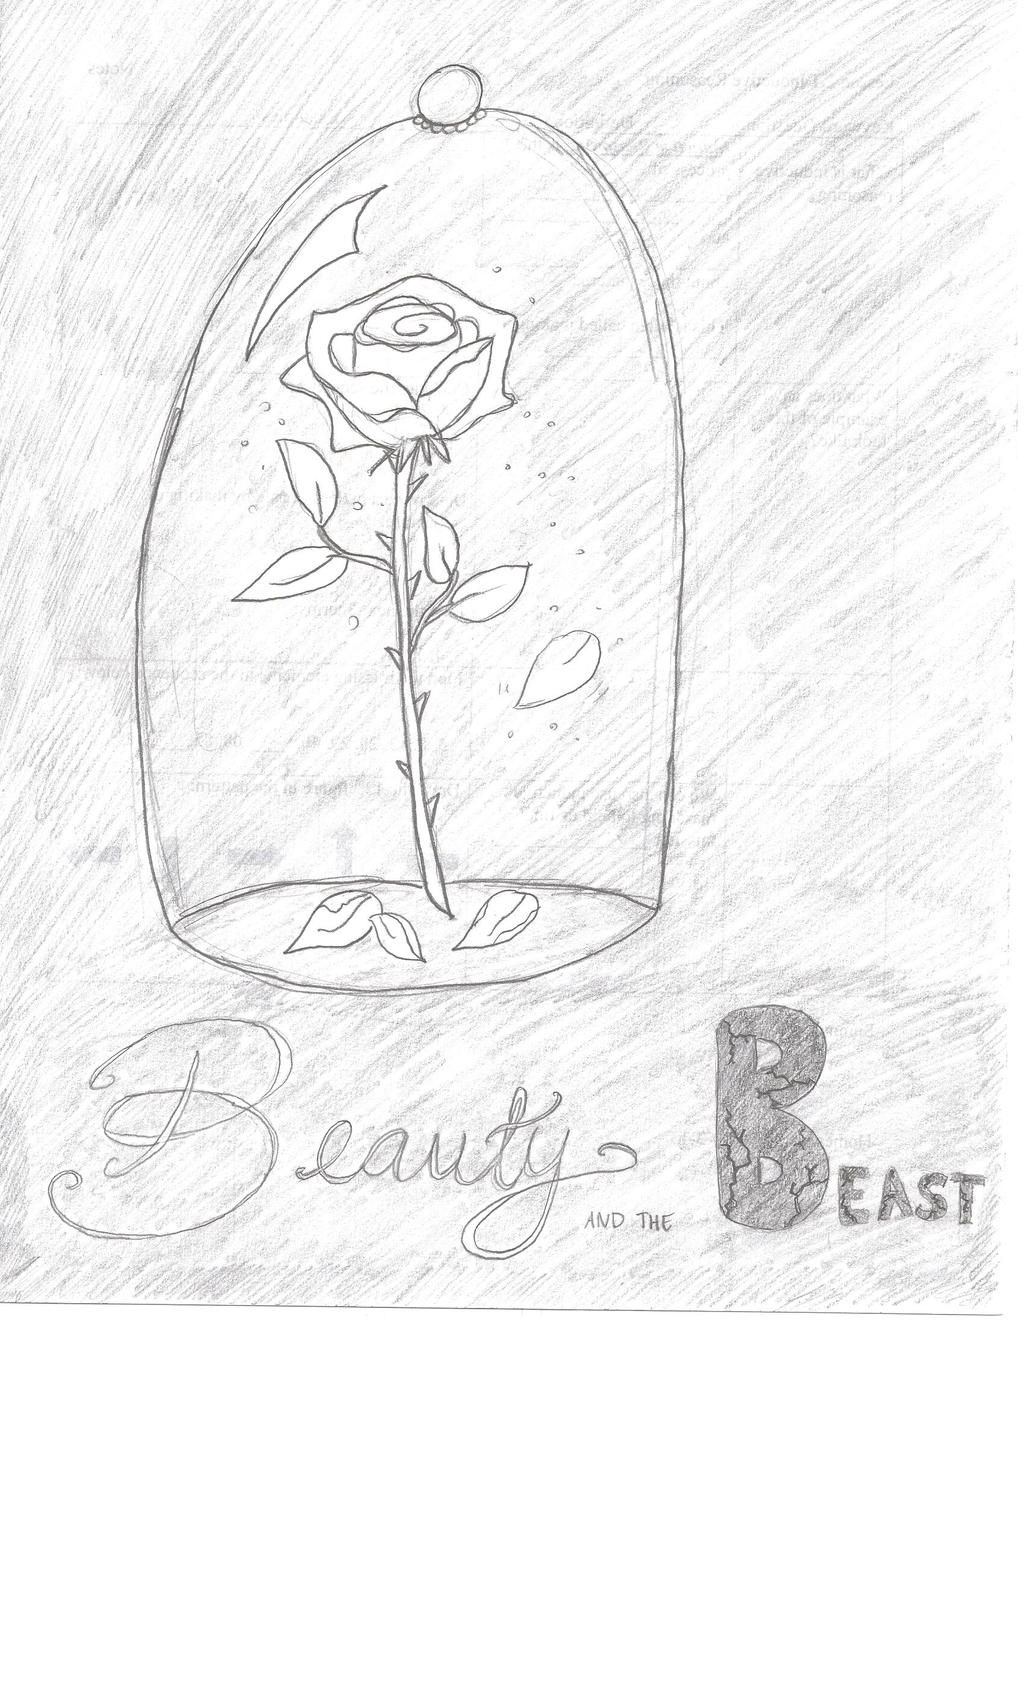 Enchanted Rose Drawing: Enchanted Rose Drawing By Julietcapulet432 On DeviantART